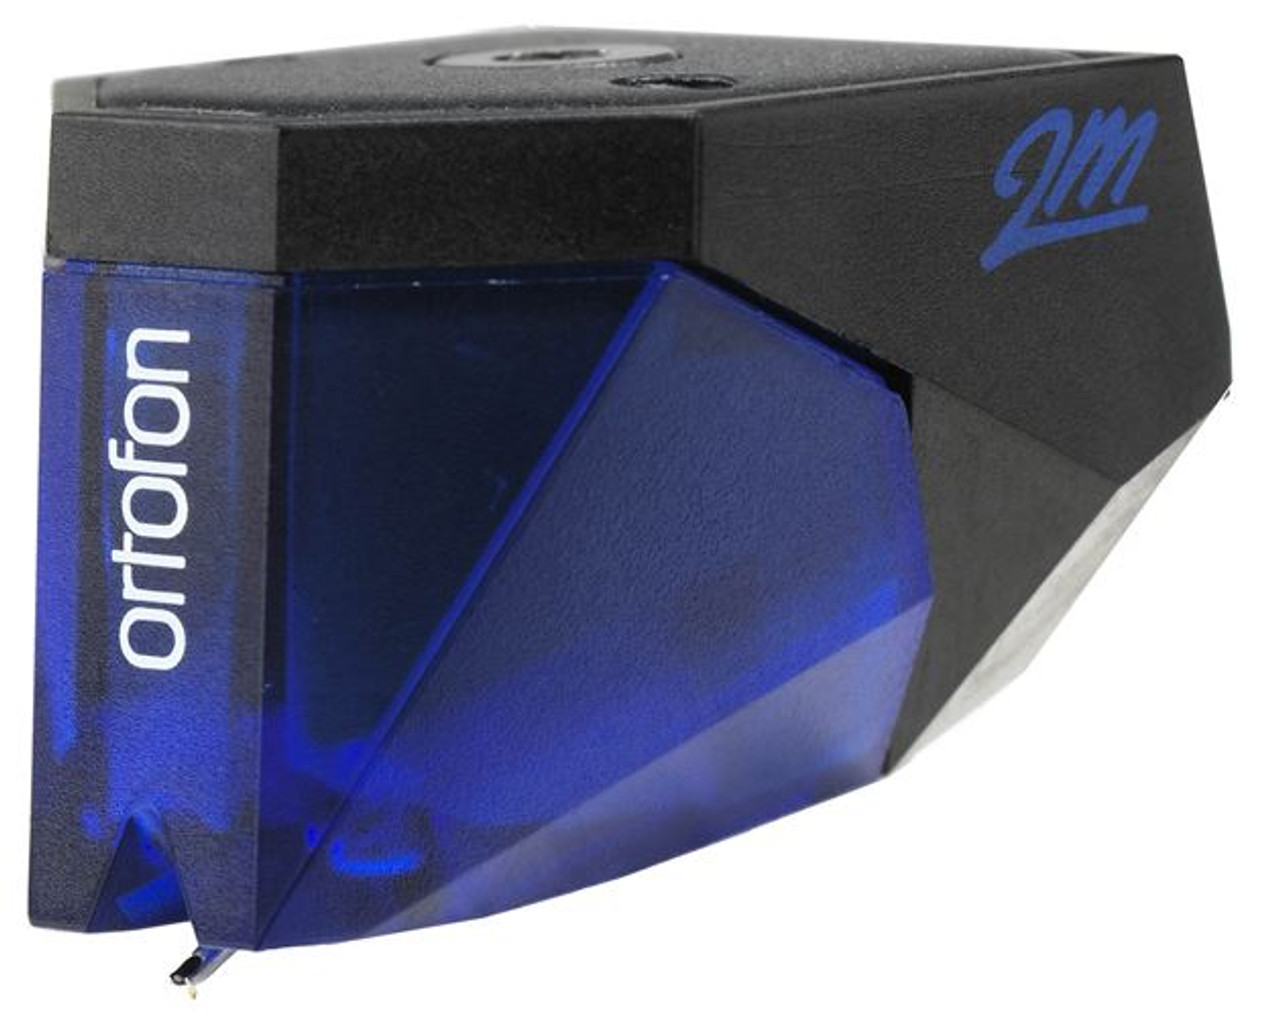 Ortofon MM Blue Phono Cartridge